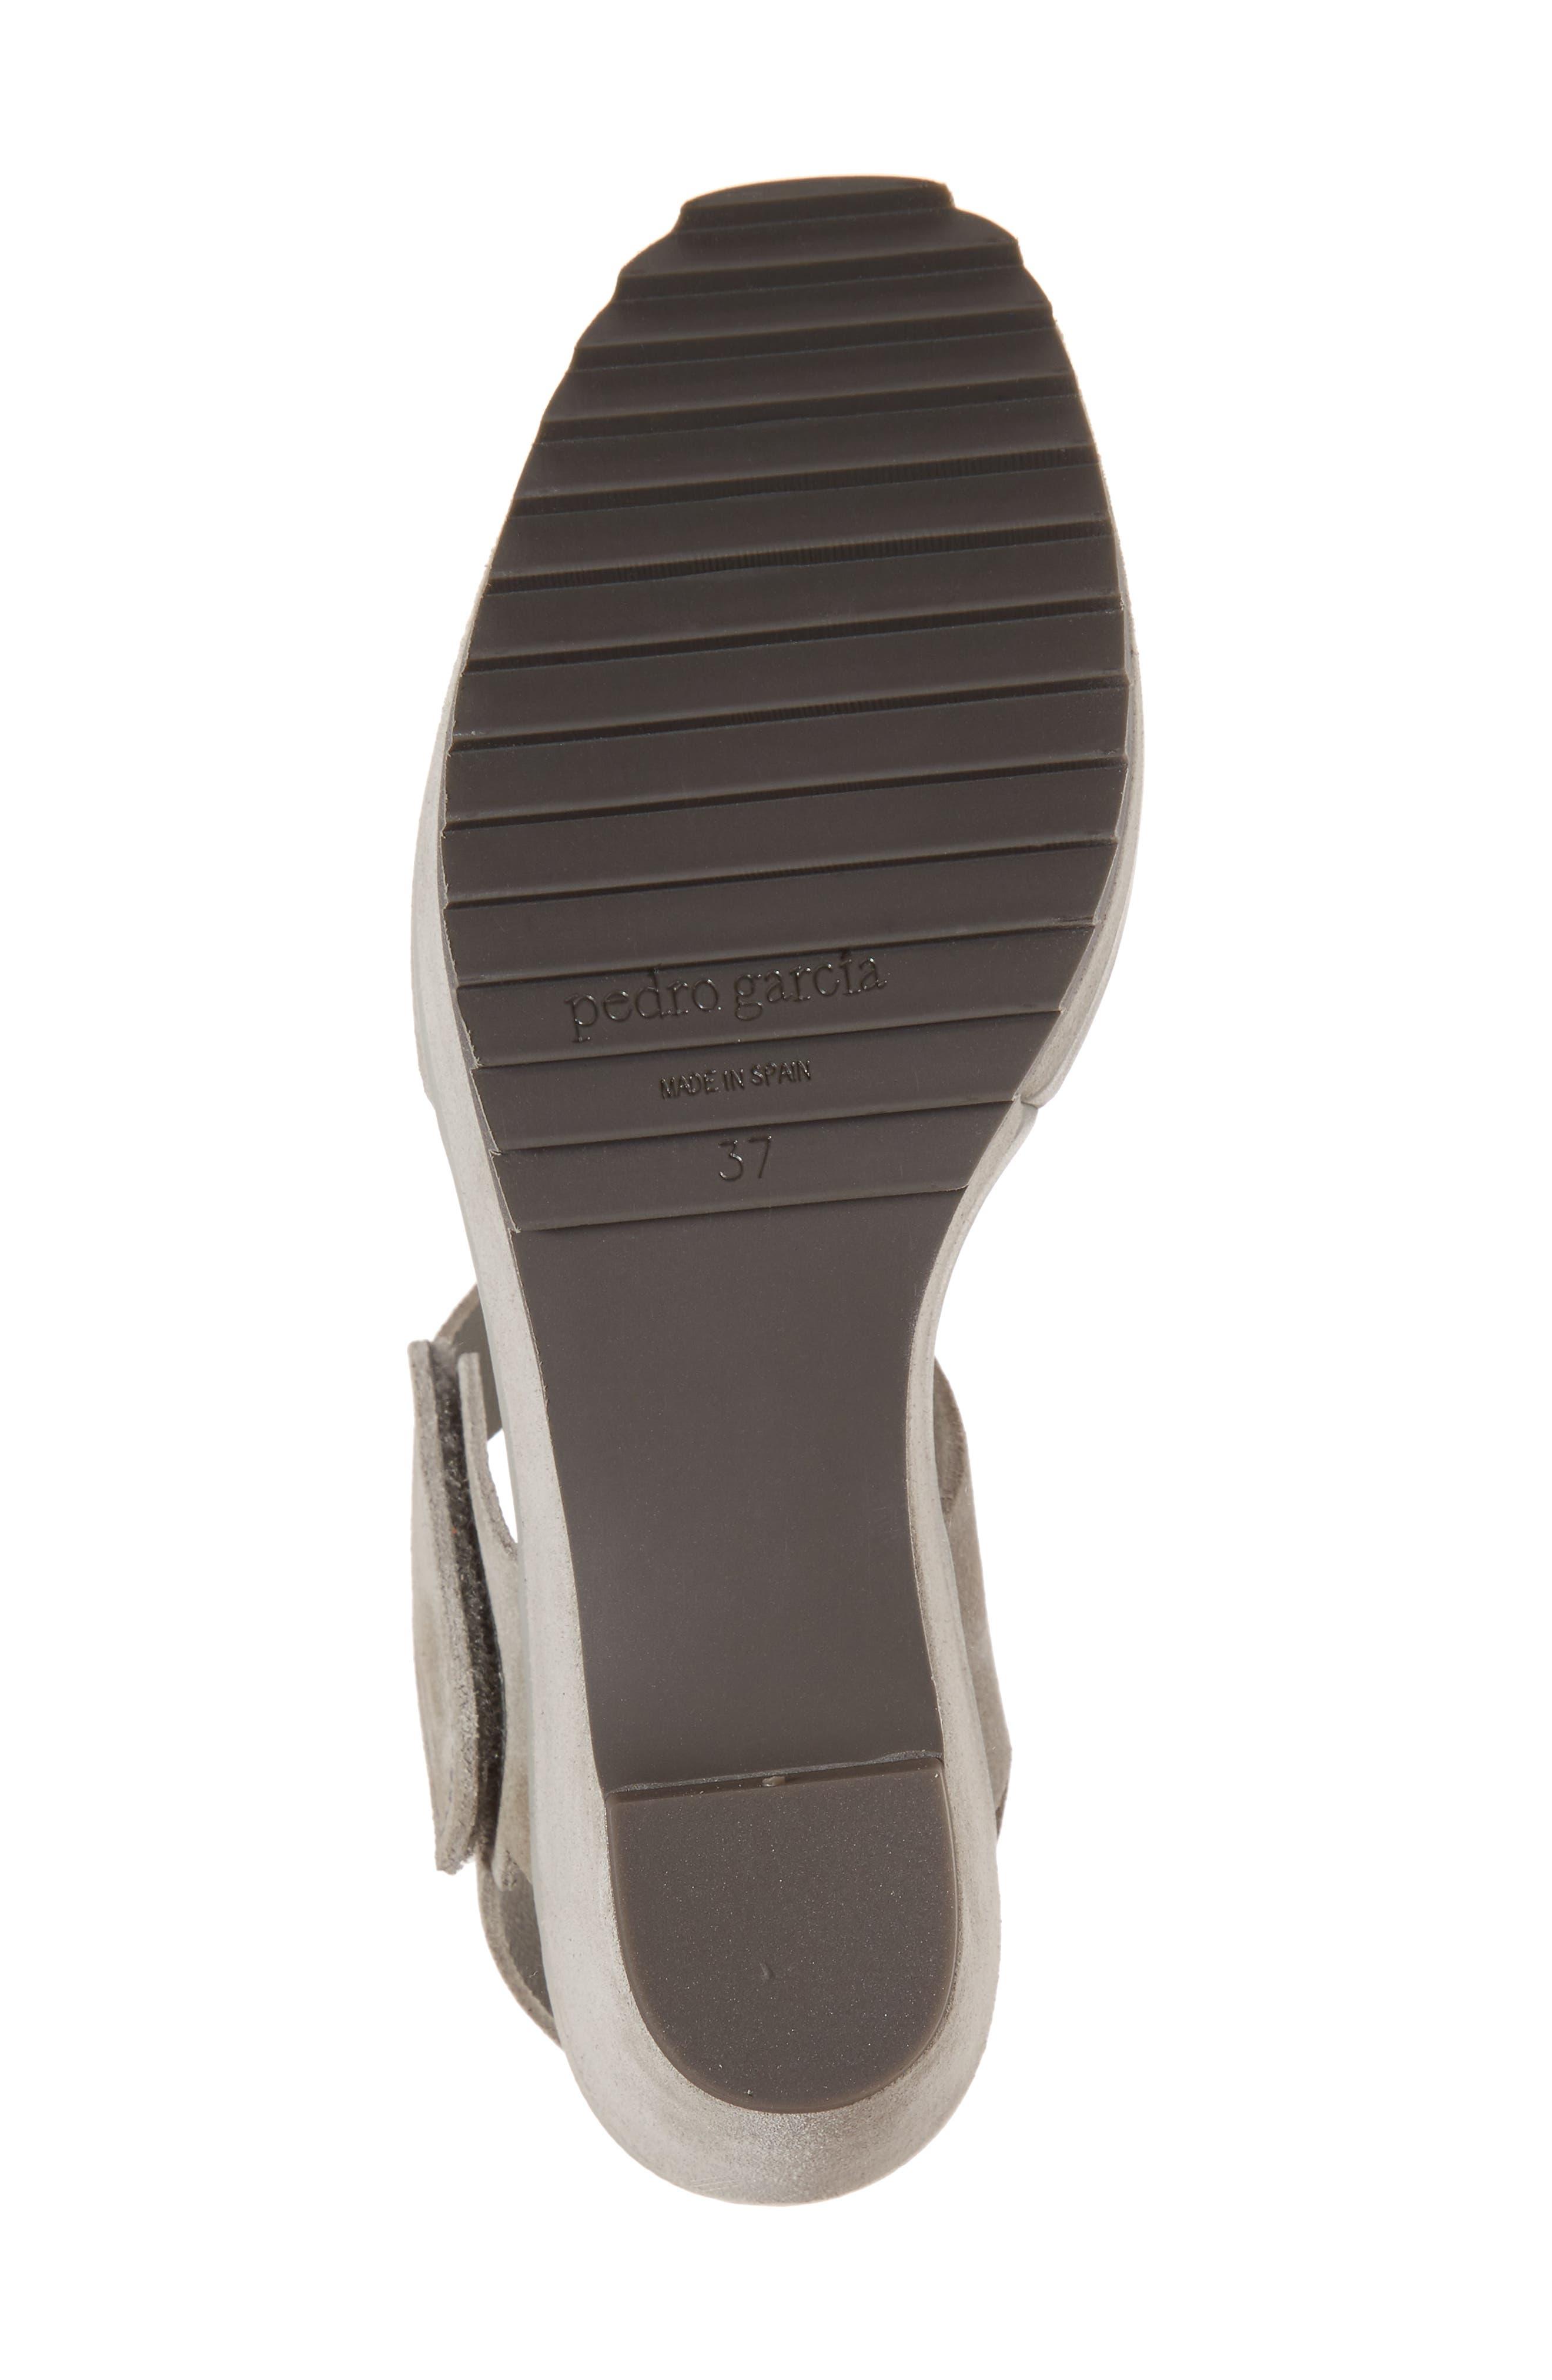 Fah Platform Wedge Sandal,                             Alternate thumbnail 6, color,                             020